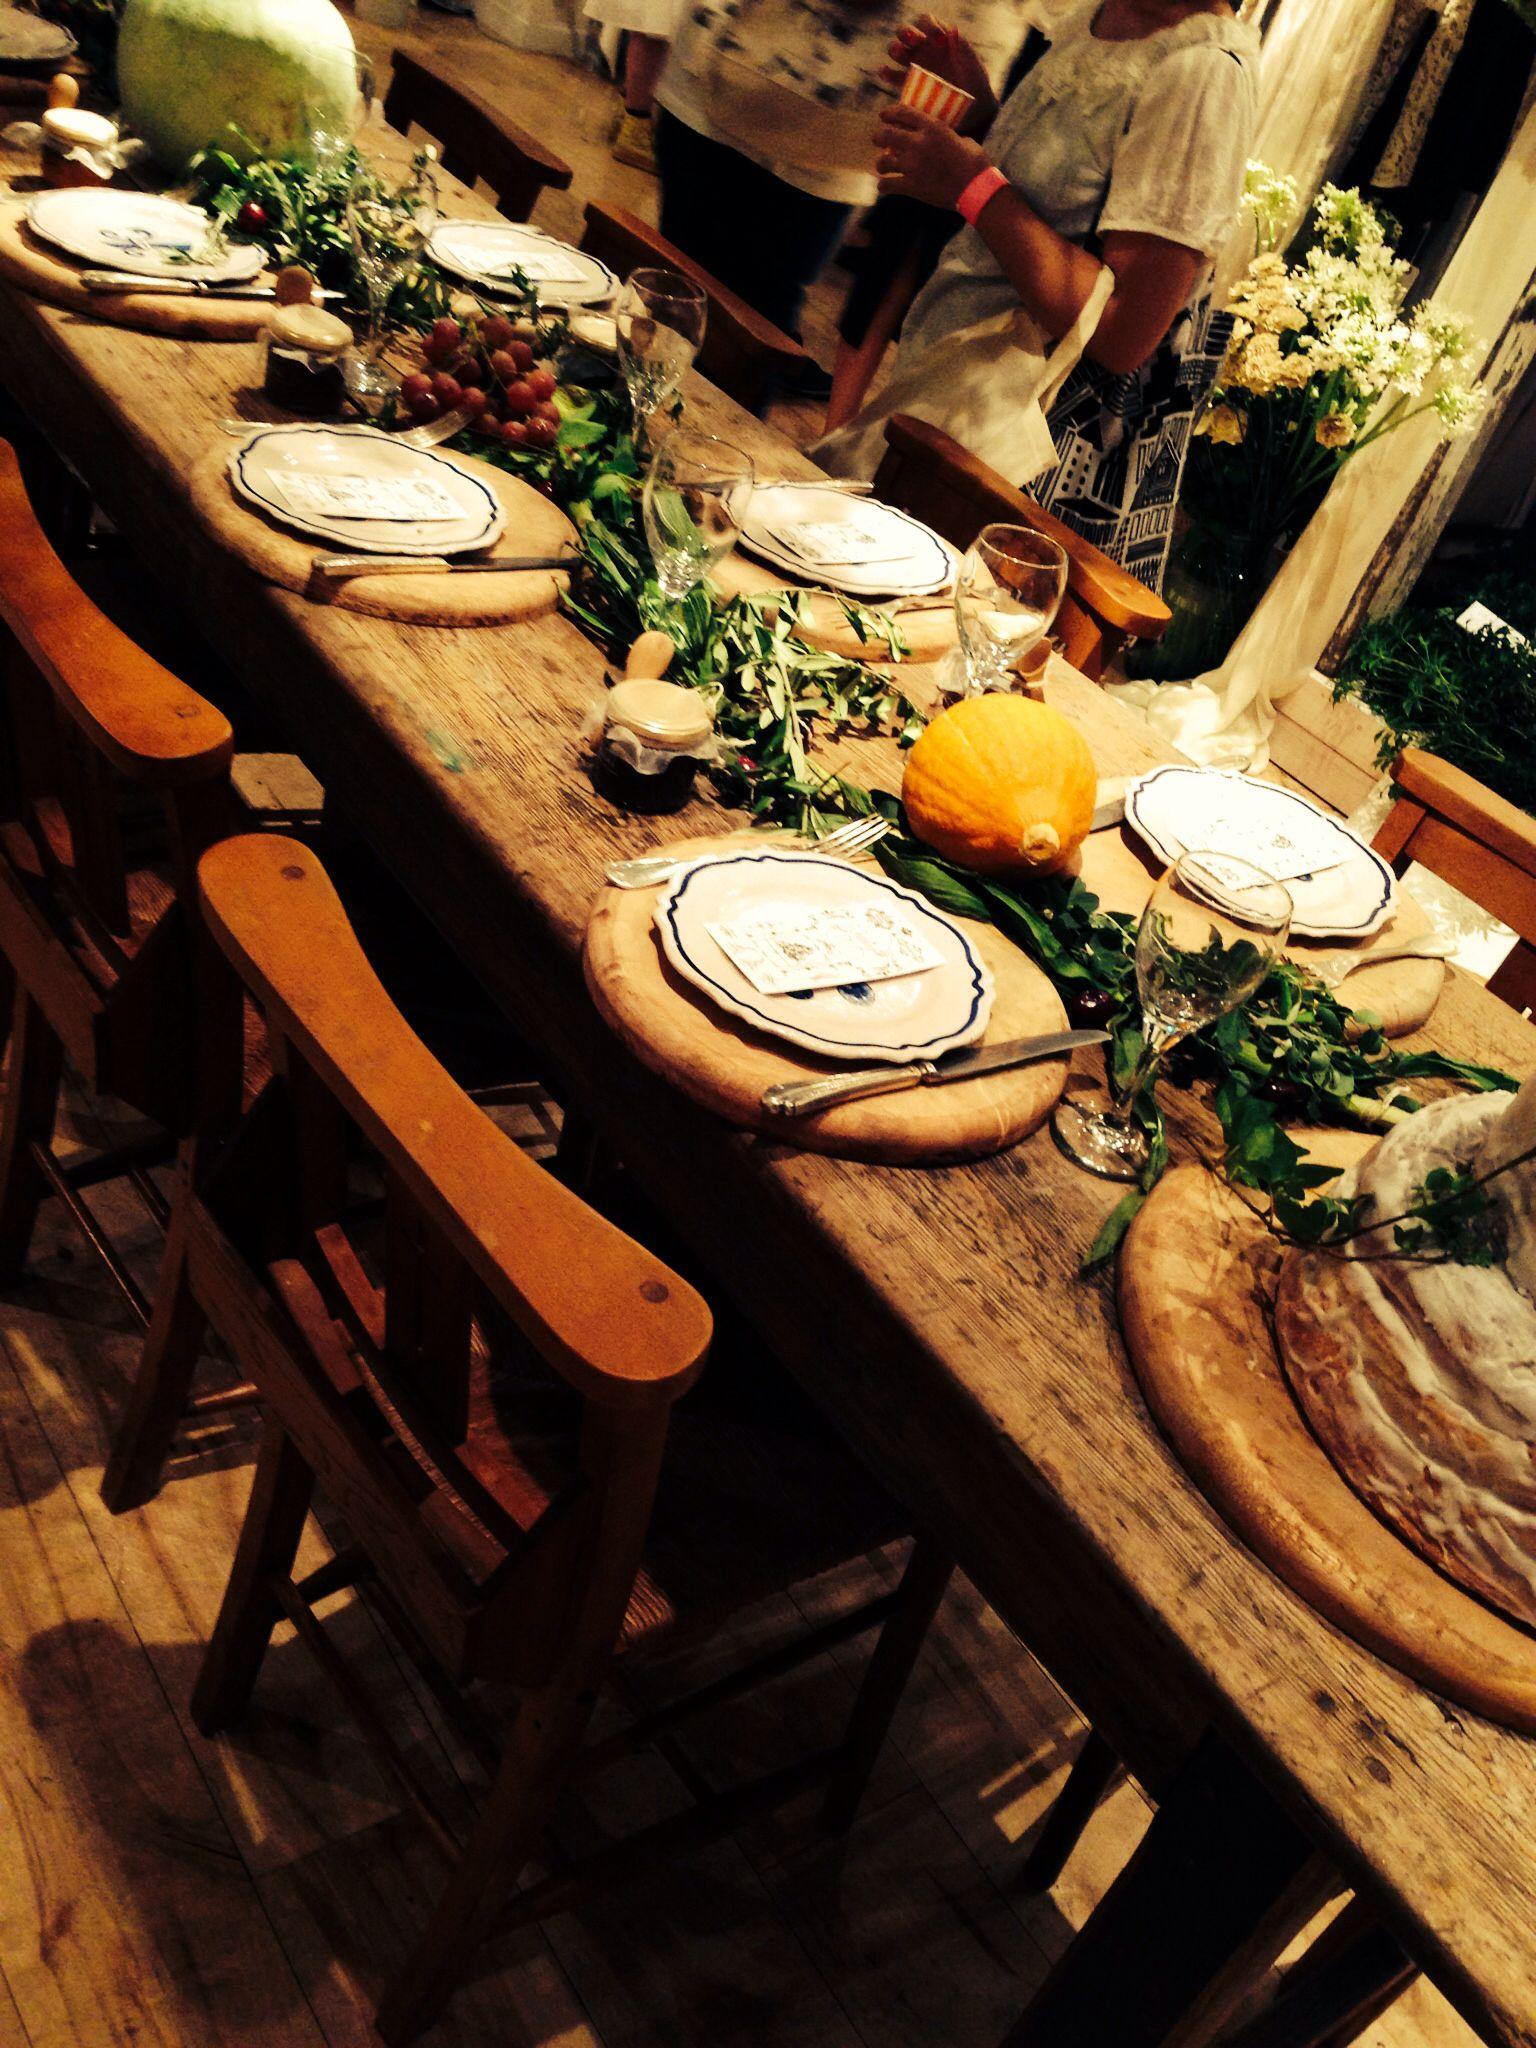 Botanical table decor